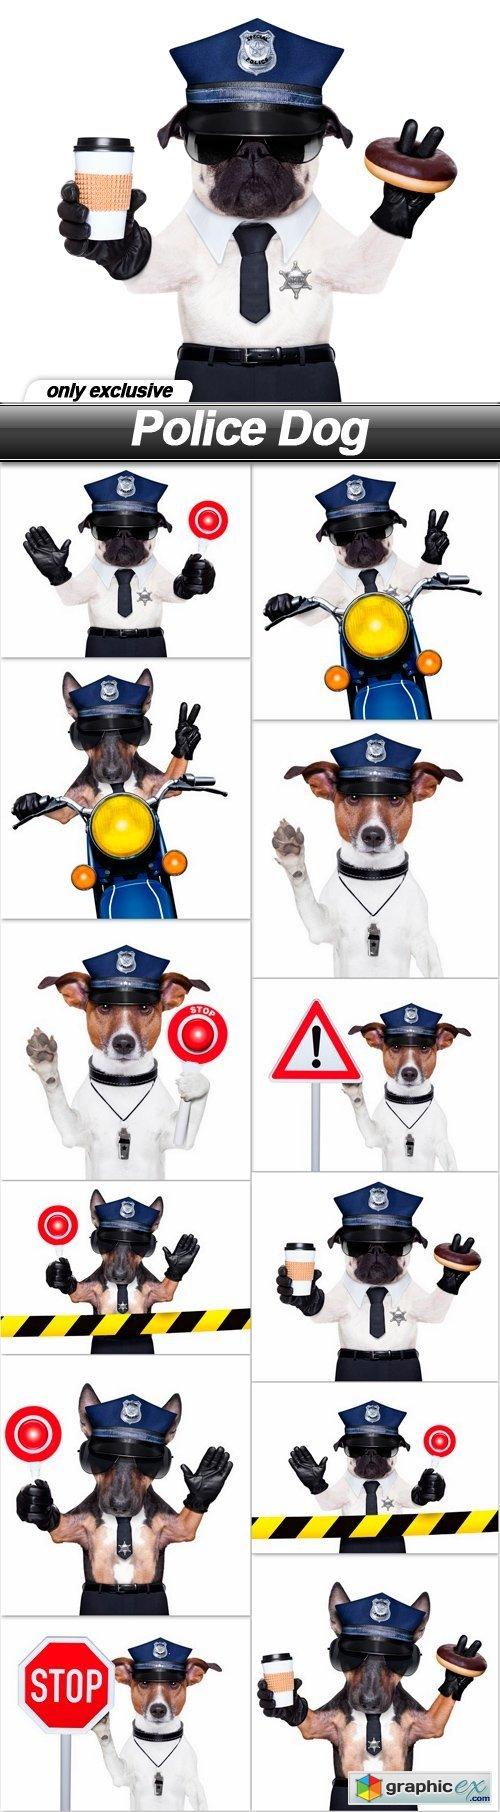 Police Dog - 12 UHQ JPEG